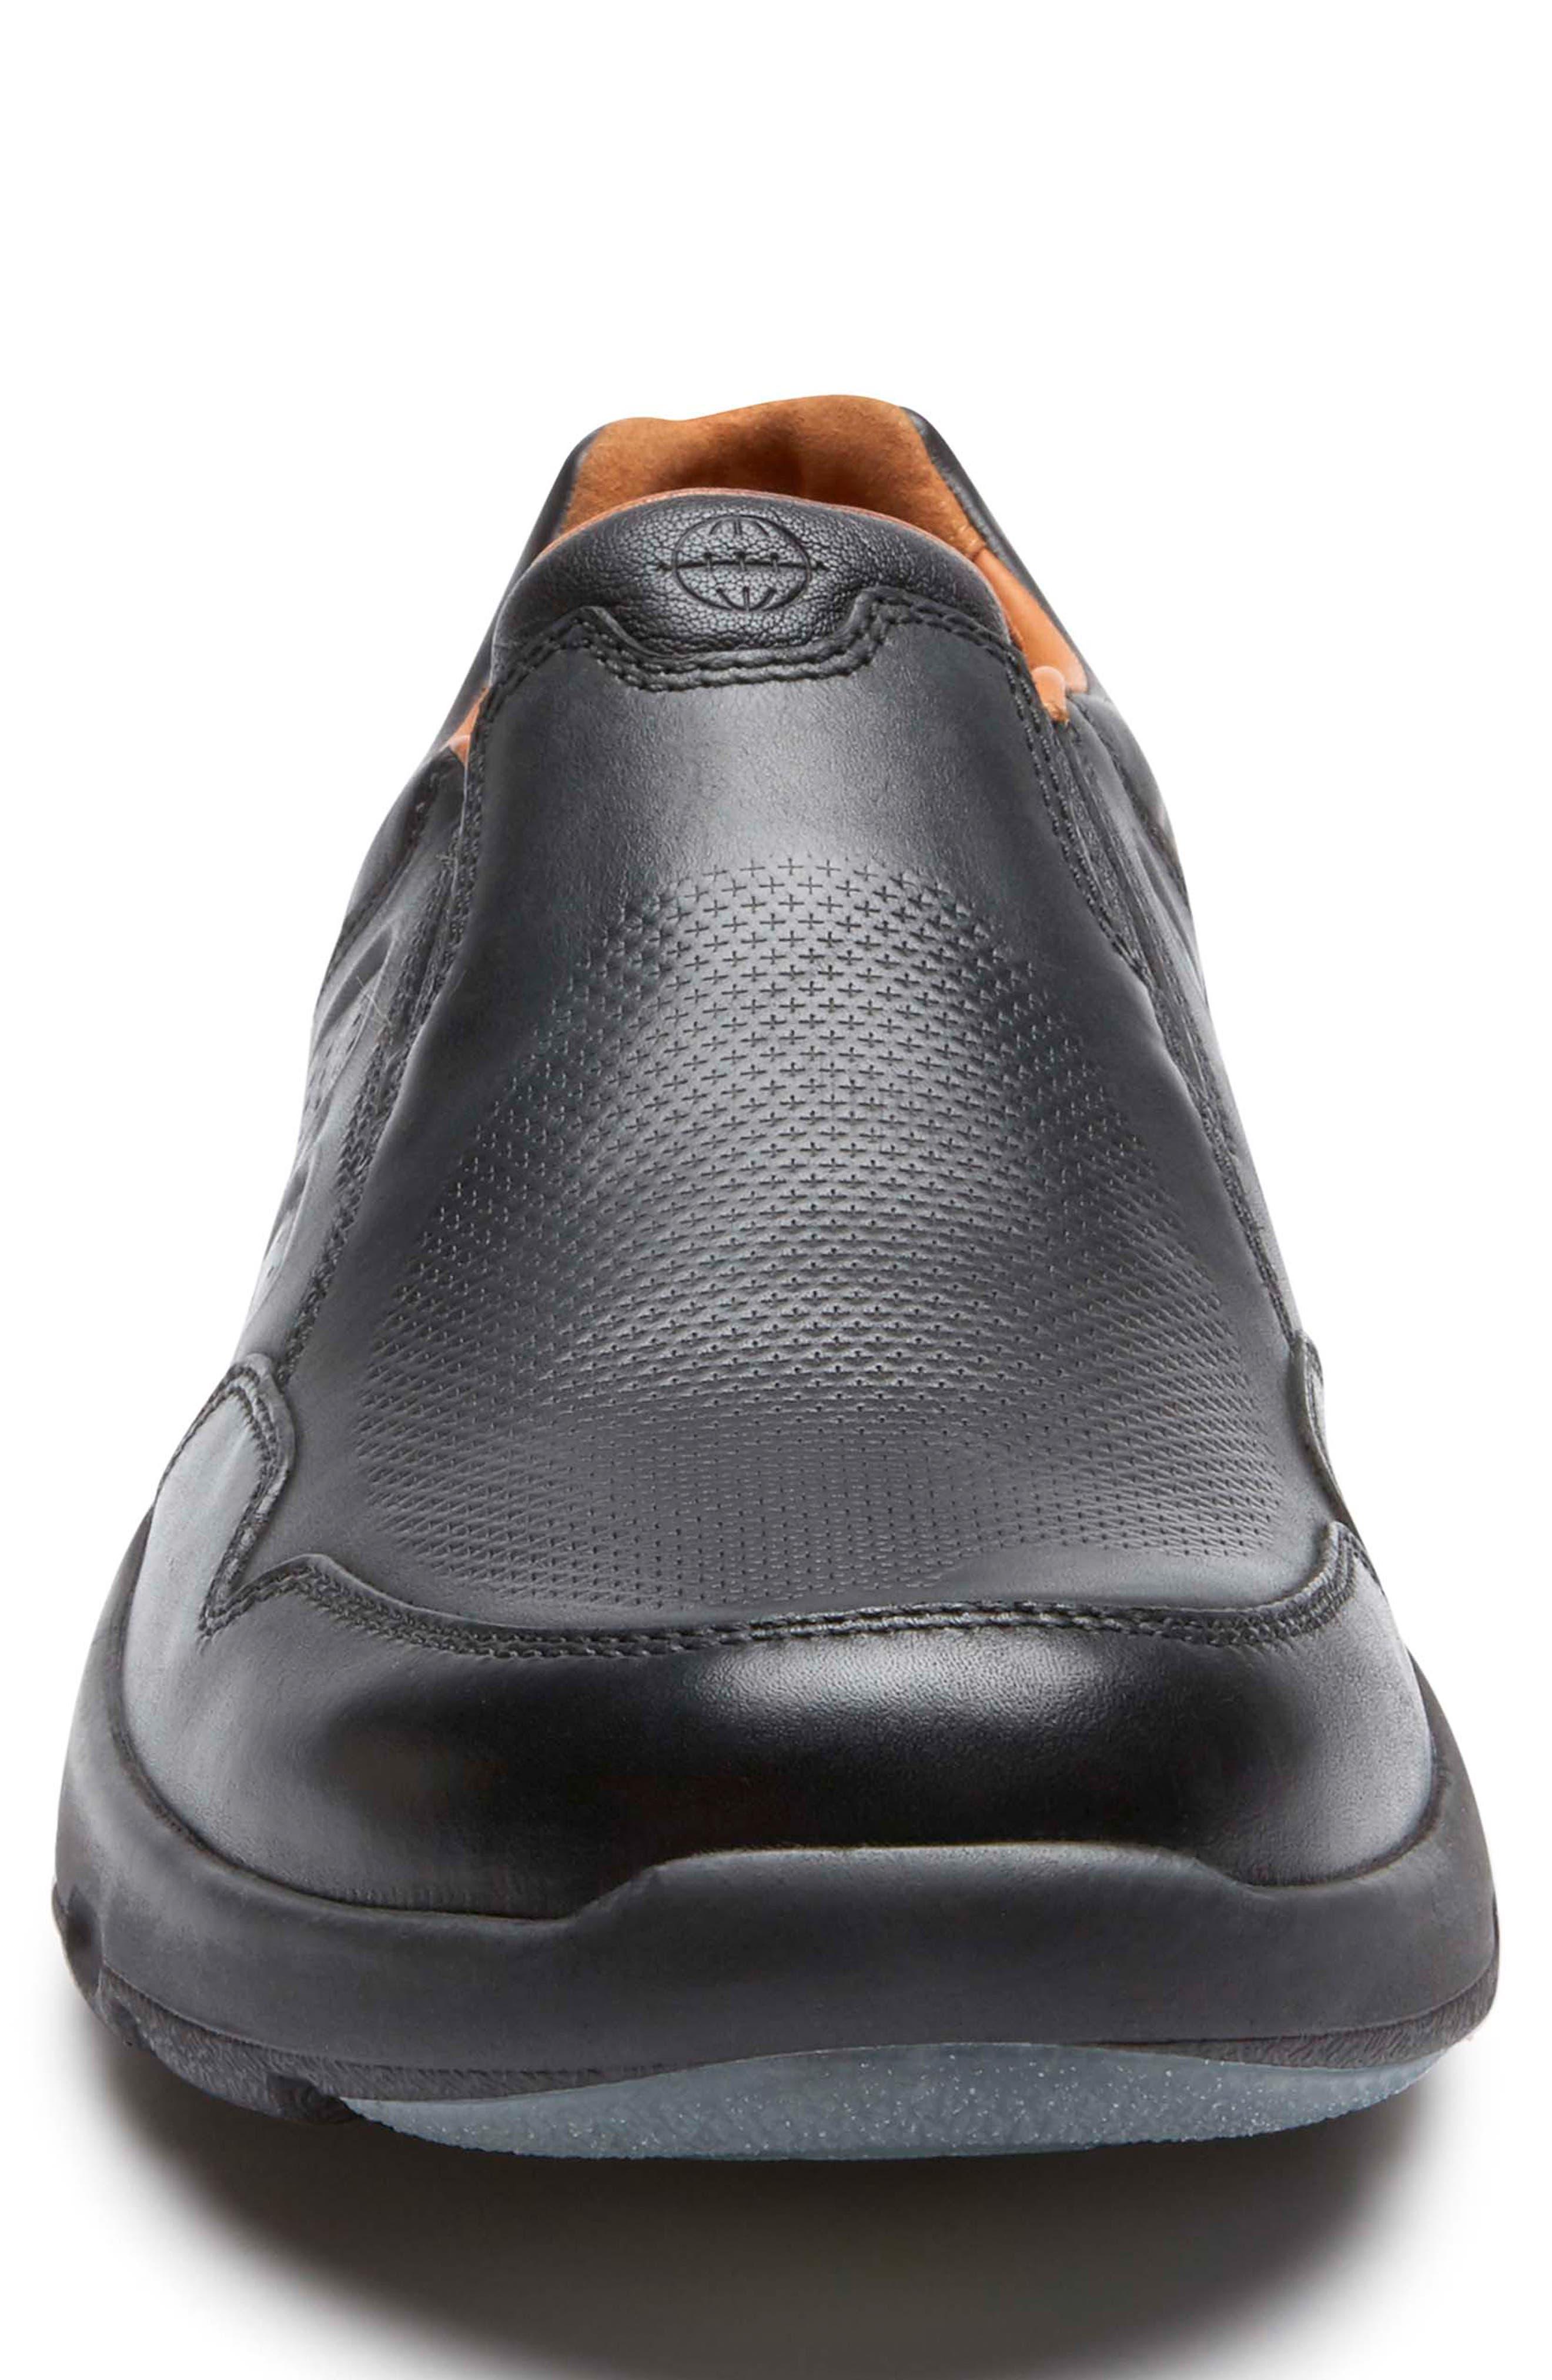 Let's Walk<sup>®</sup> Venetian Loafer,                             Alternate thumbnail 4, color,                             BLACK LEATHER